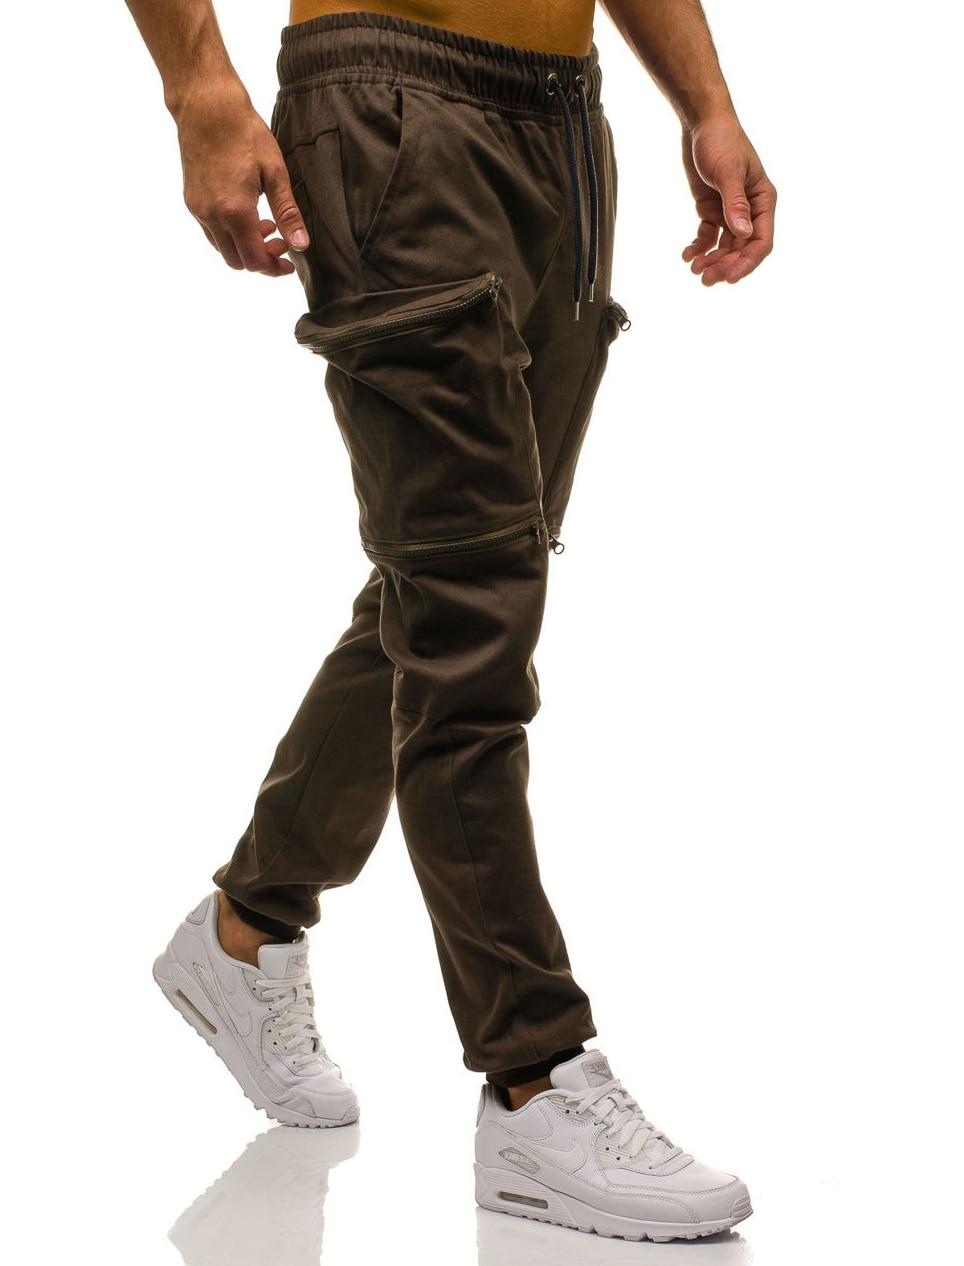 HTB1FO2eLYvpK1RjSZPiq6zmwXXaT Mens Joggers 2019 New Red Camouflage Multi-Pockets Cargo Pants Men Cotton Harem Pants Hip Hop Trousers Streetwear XXXL